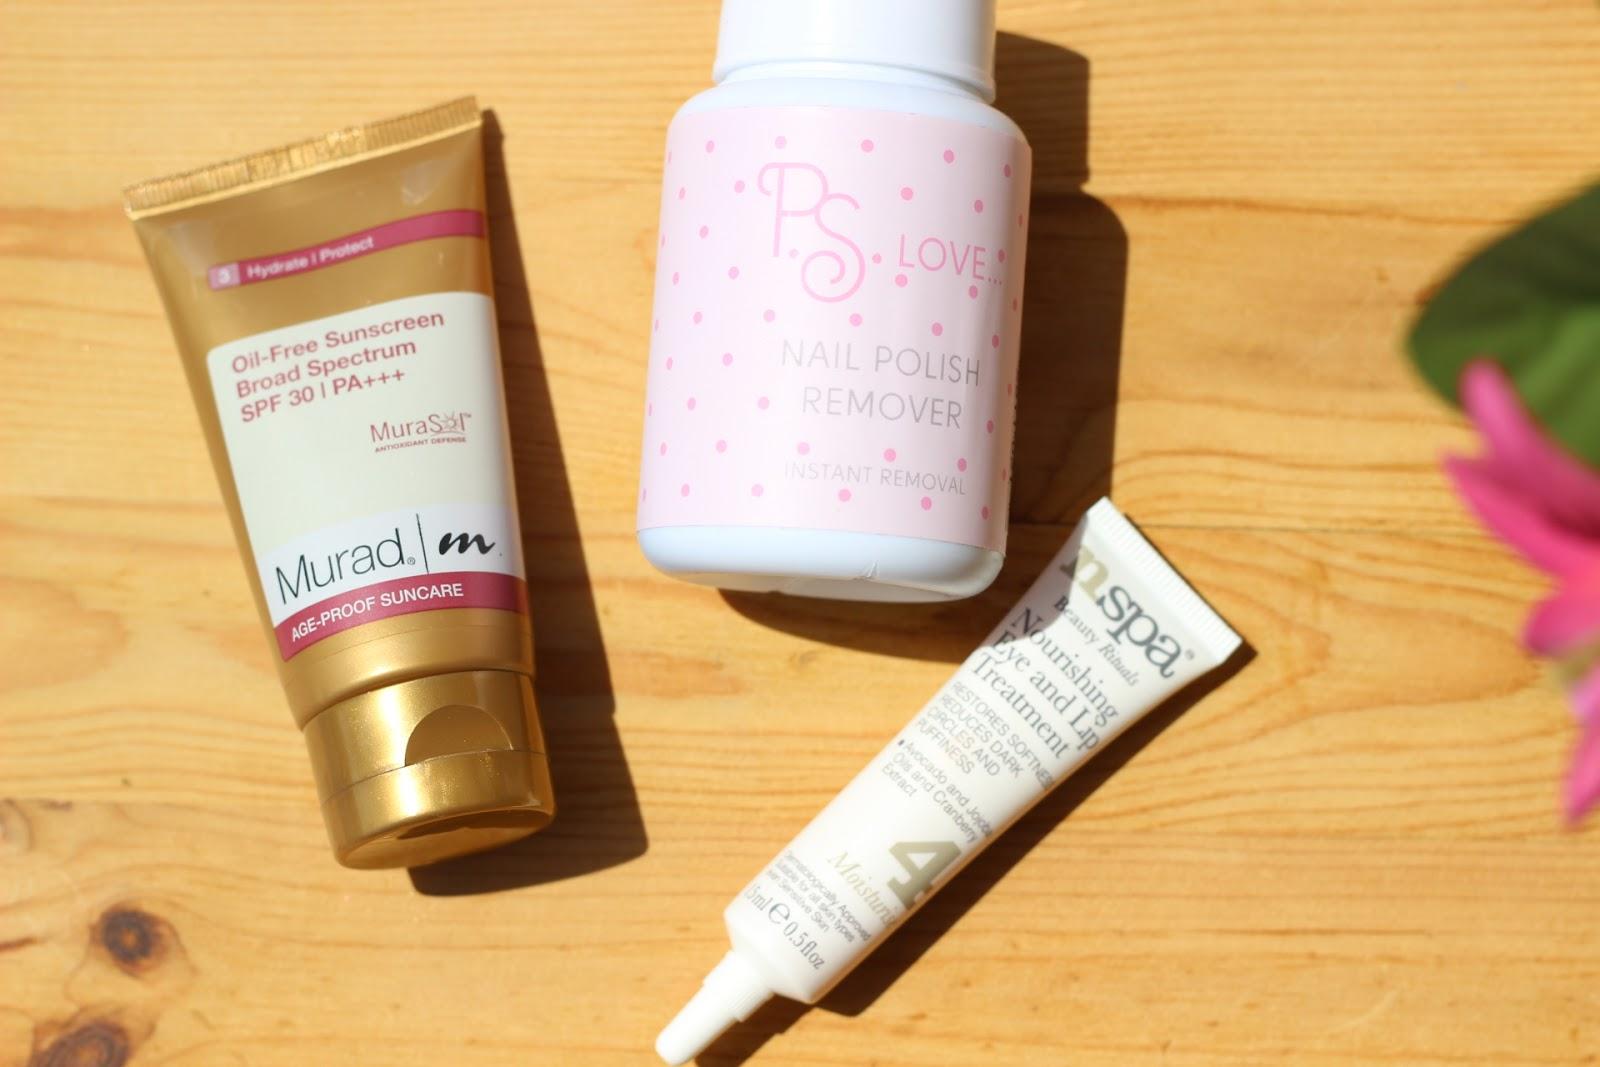 sunscreen, nail polish remover, eye cream